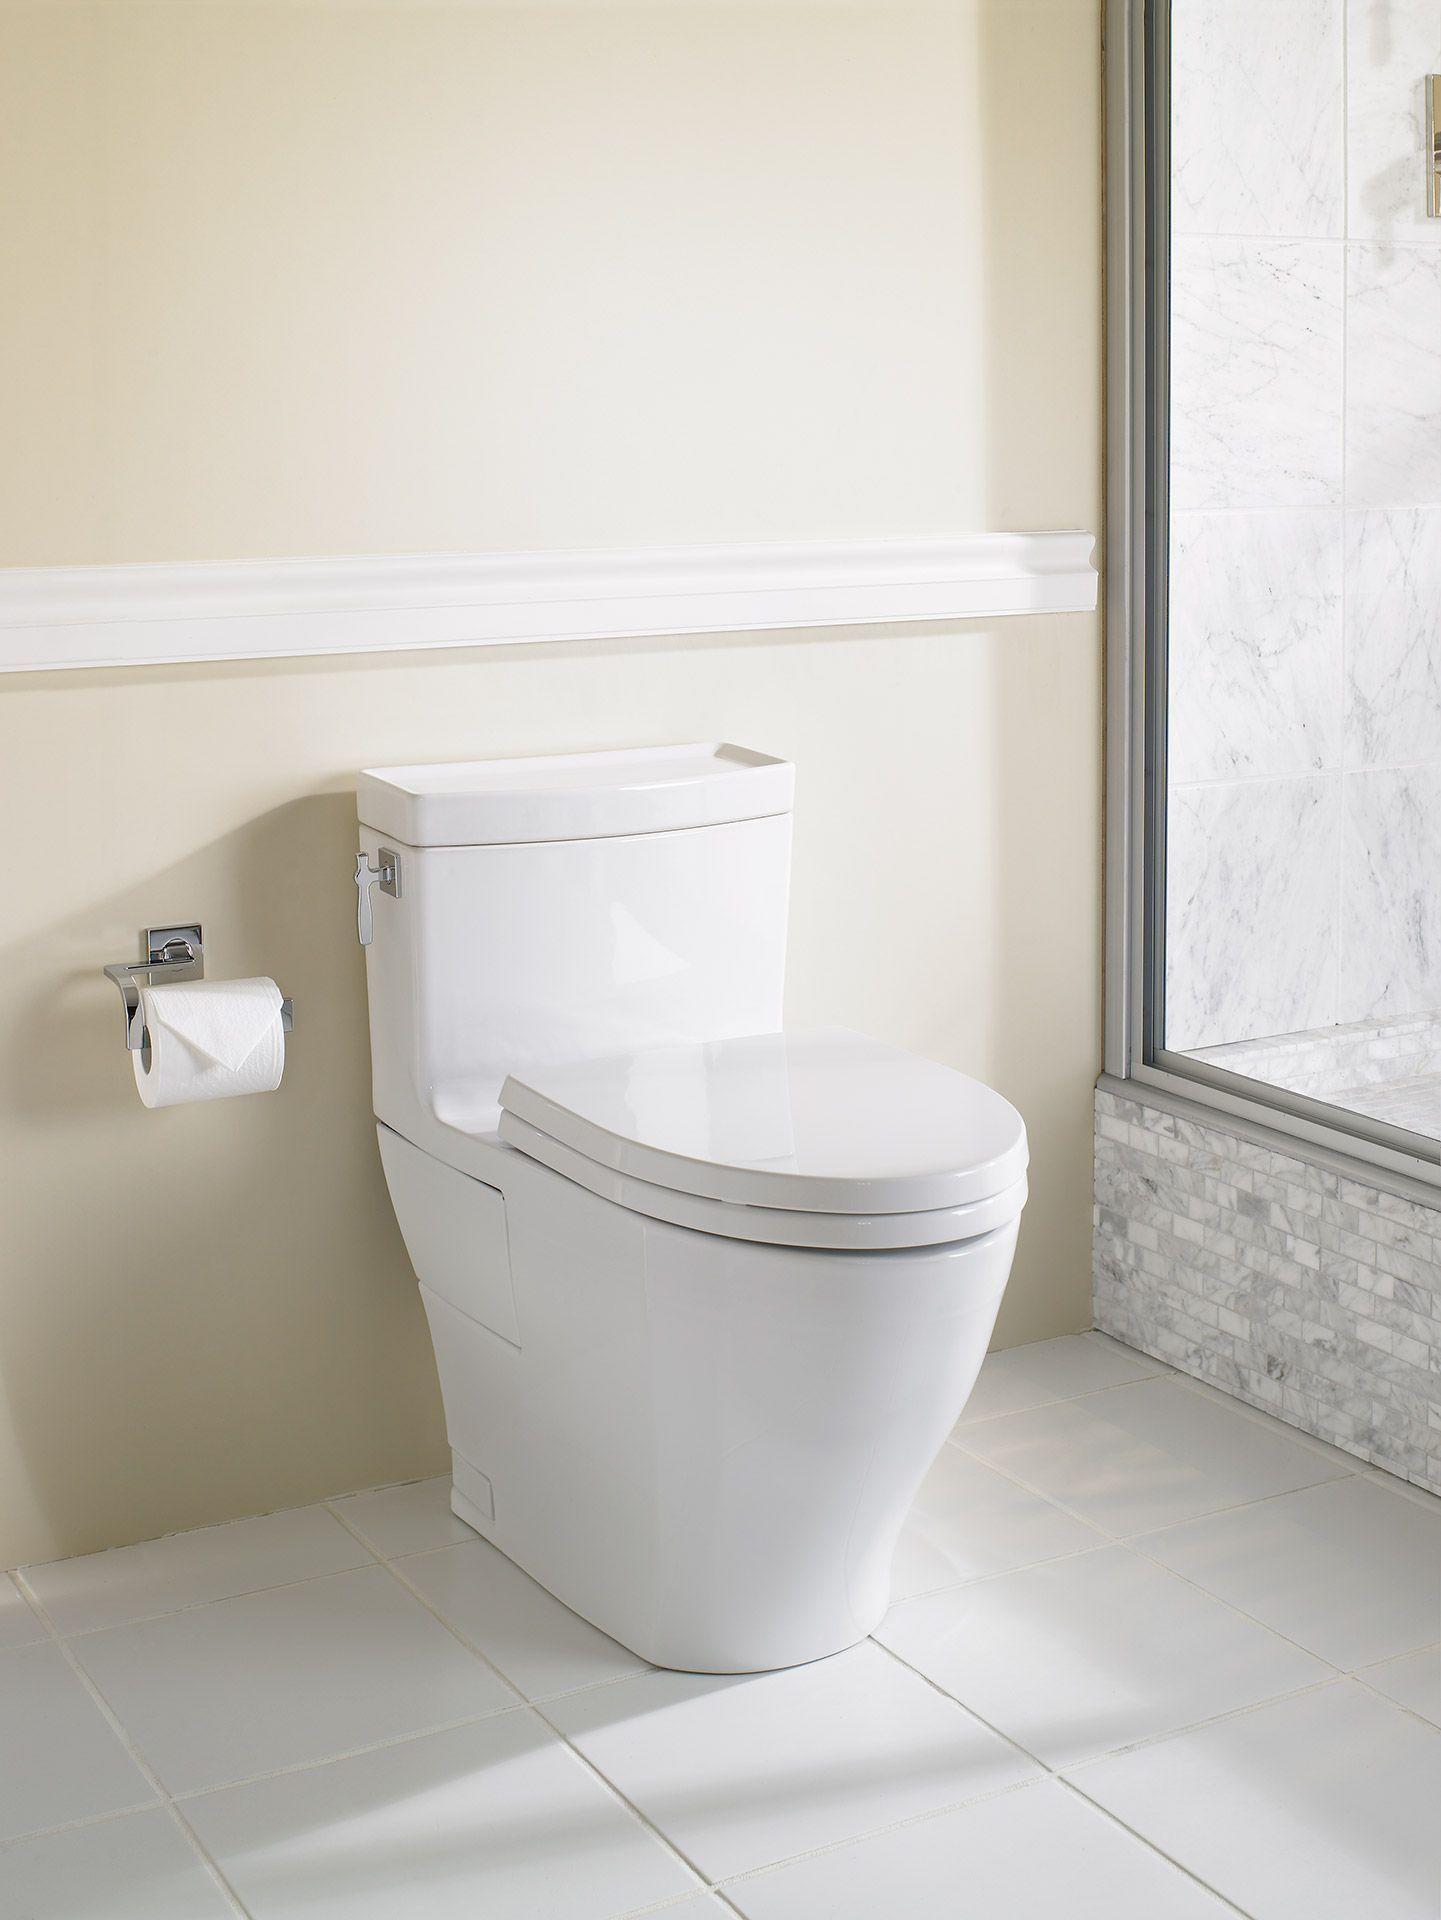 Aimes® One-Piece Toilet, 1.28GPF, Elongated Bowl - TotoUSA.com   FGG ...